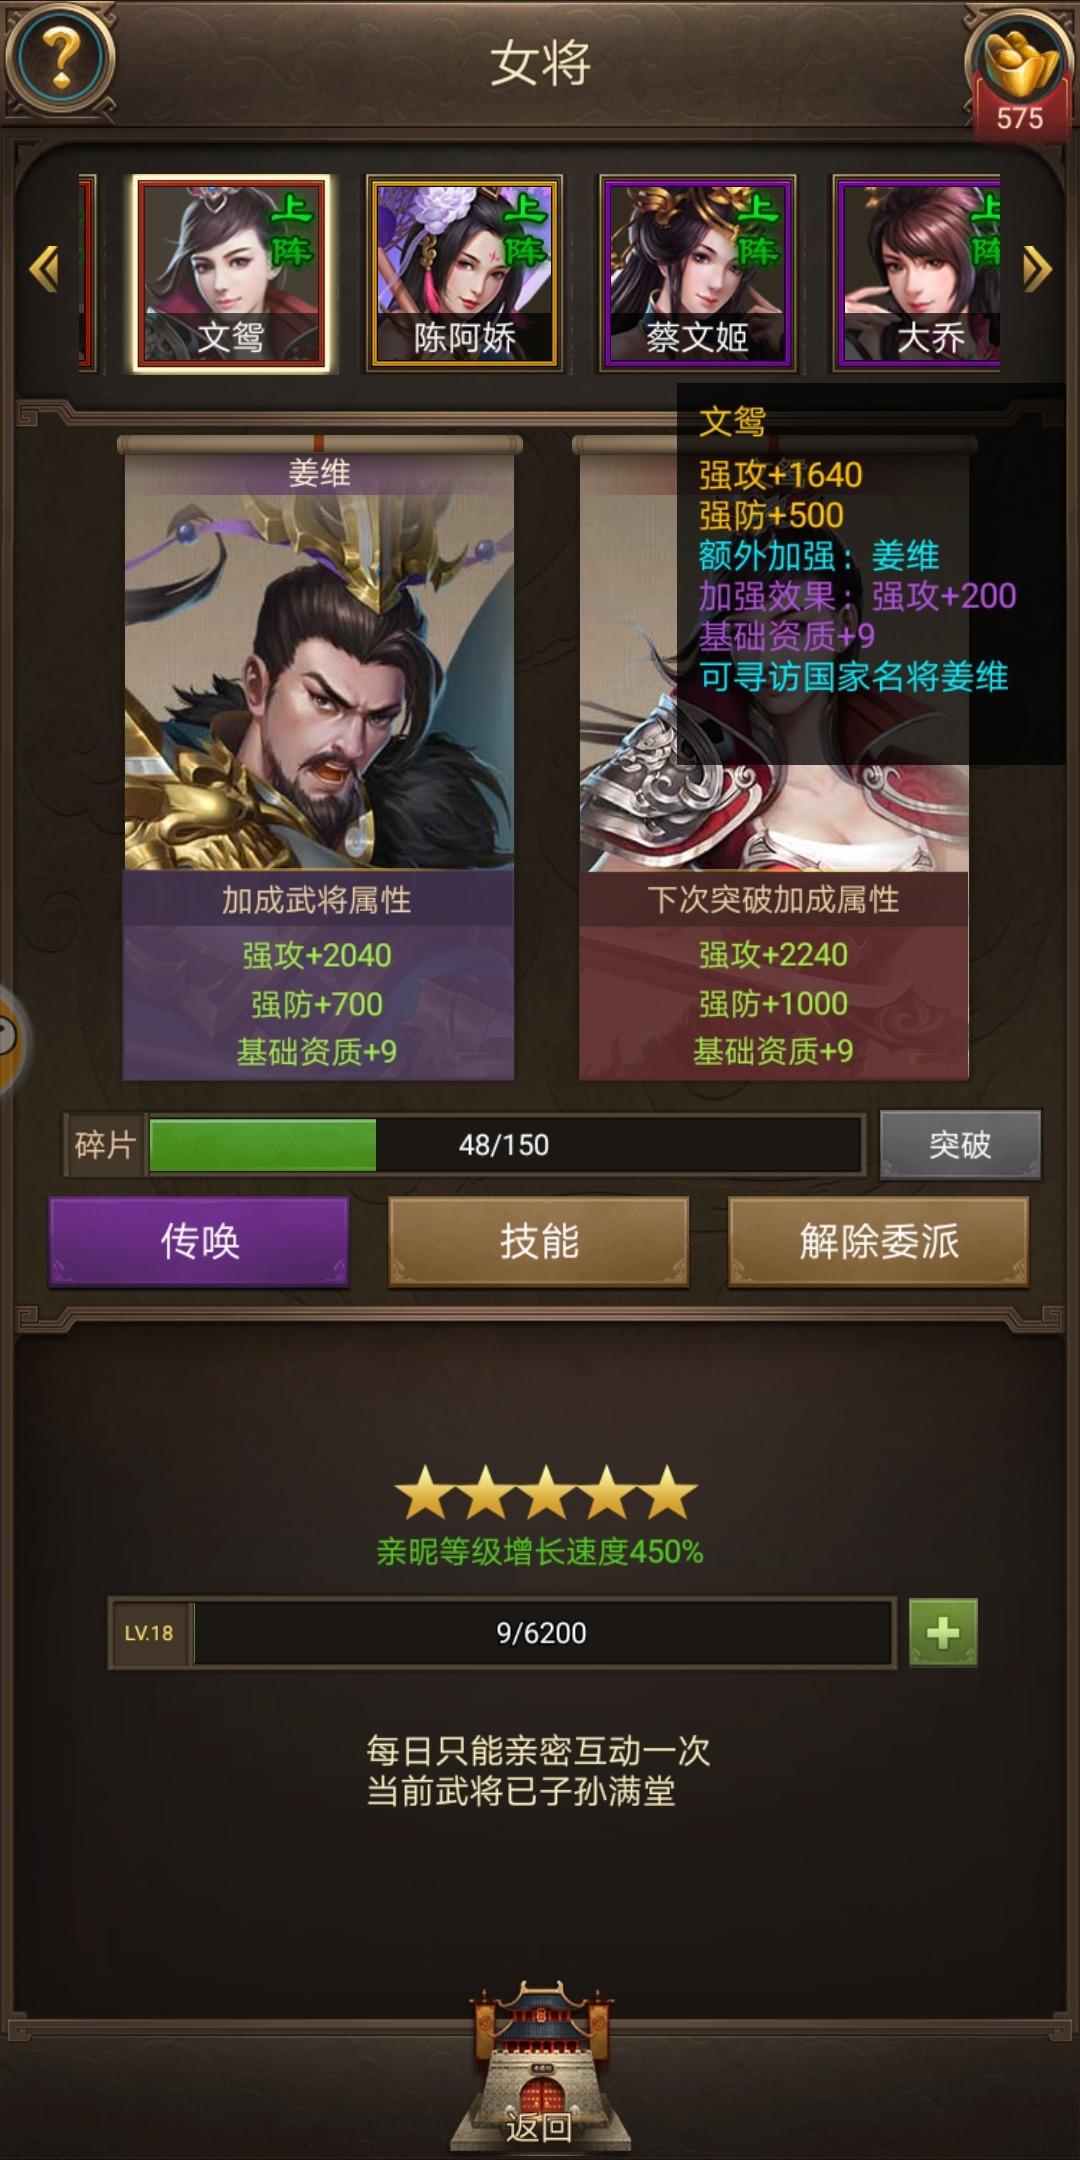 Screenshot_20200306_182647_com.juedigame.fyzh.shoumeng.jpg